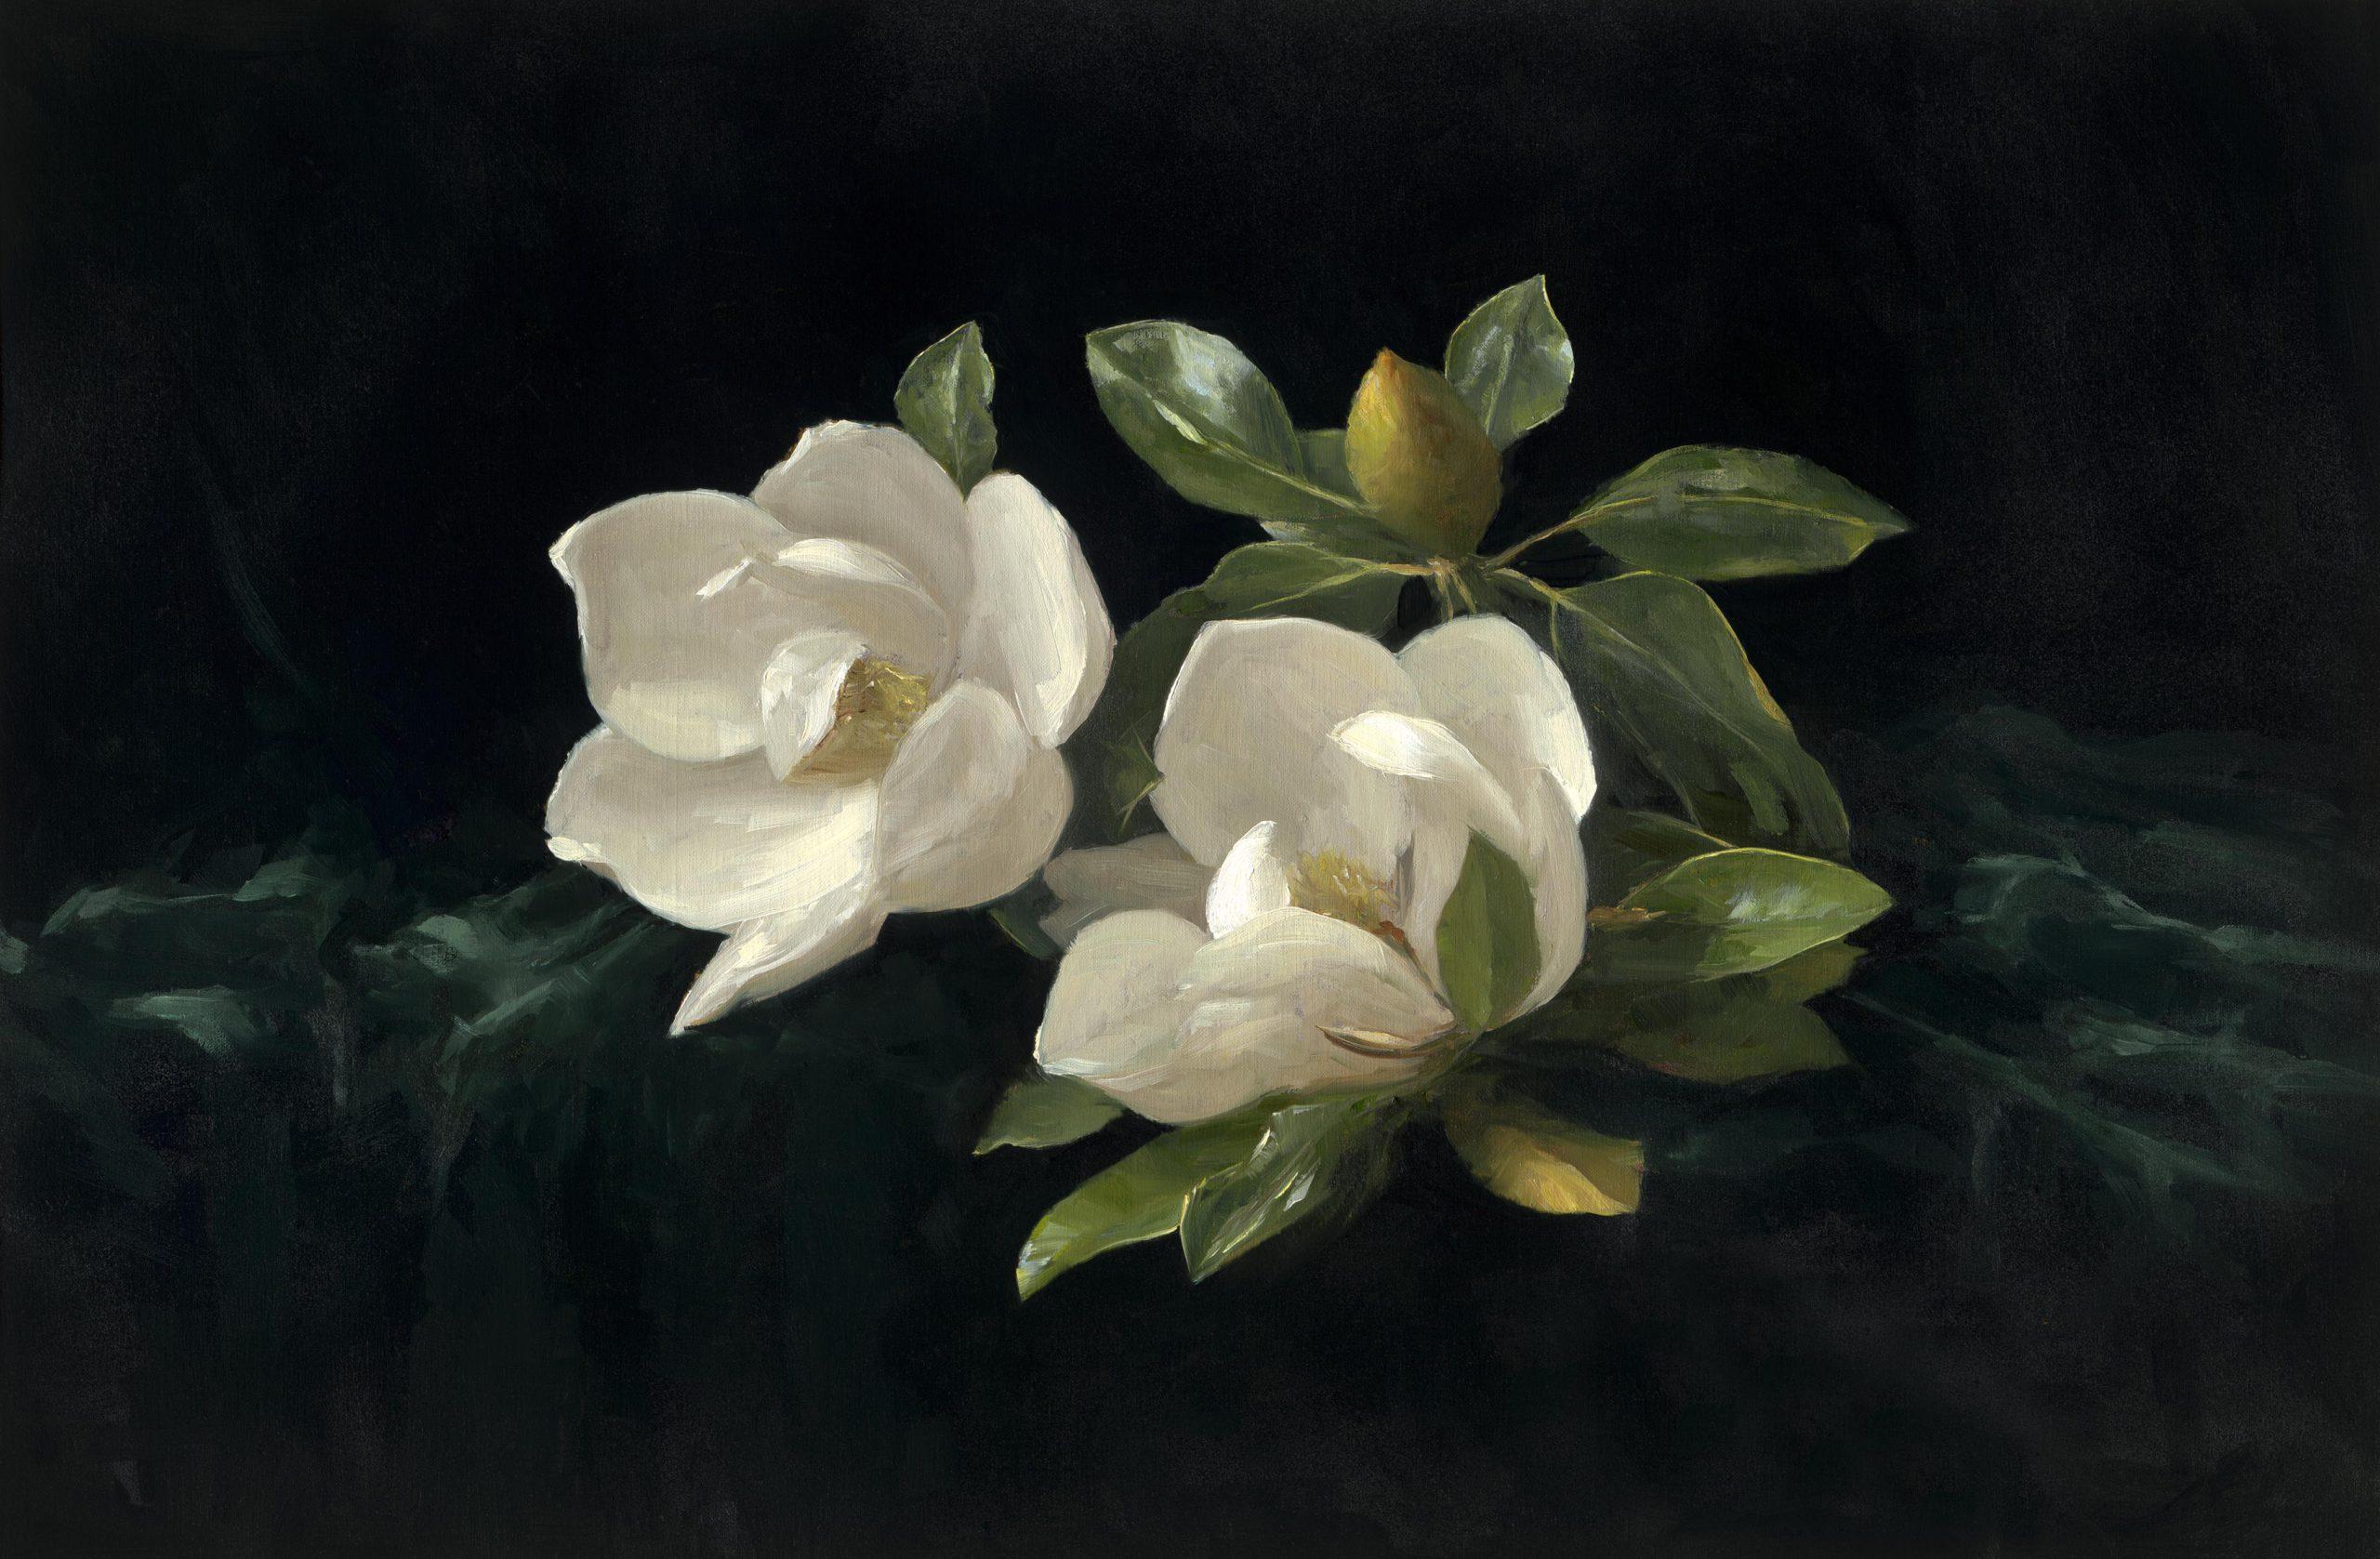 Sarah Lamb - Two Magnolias